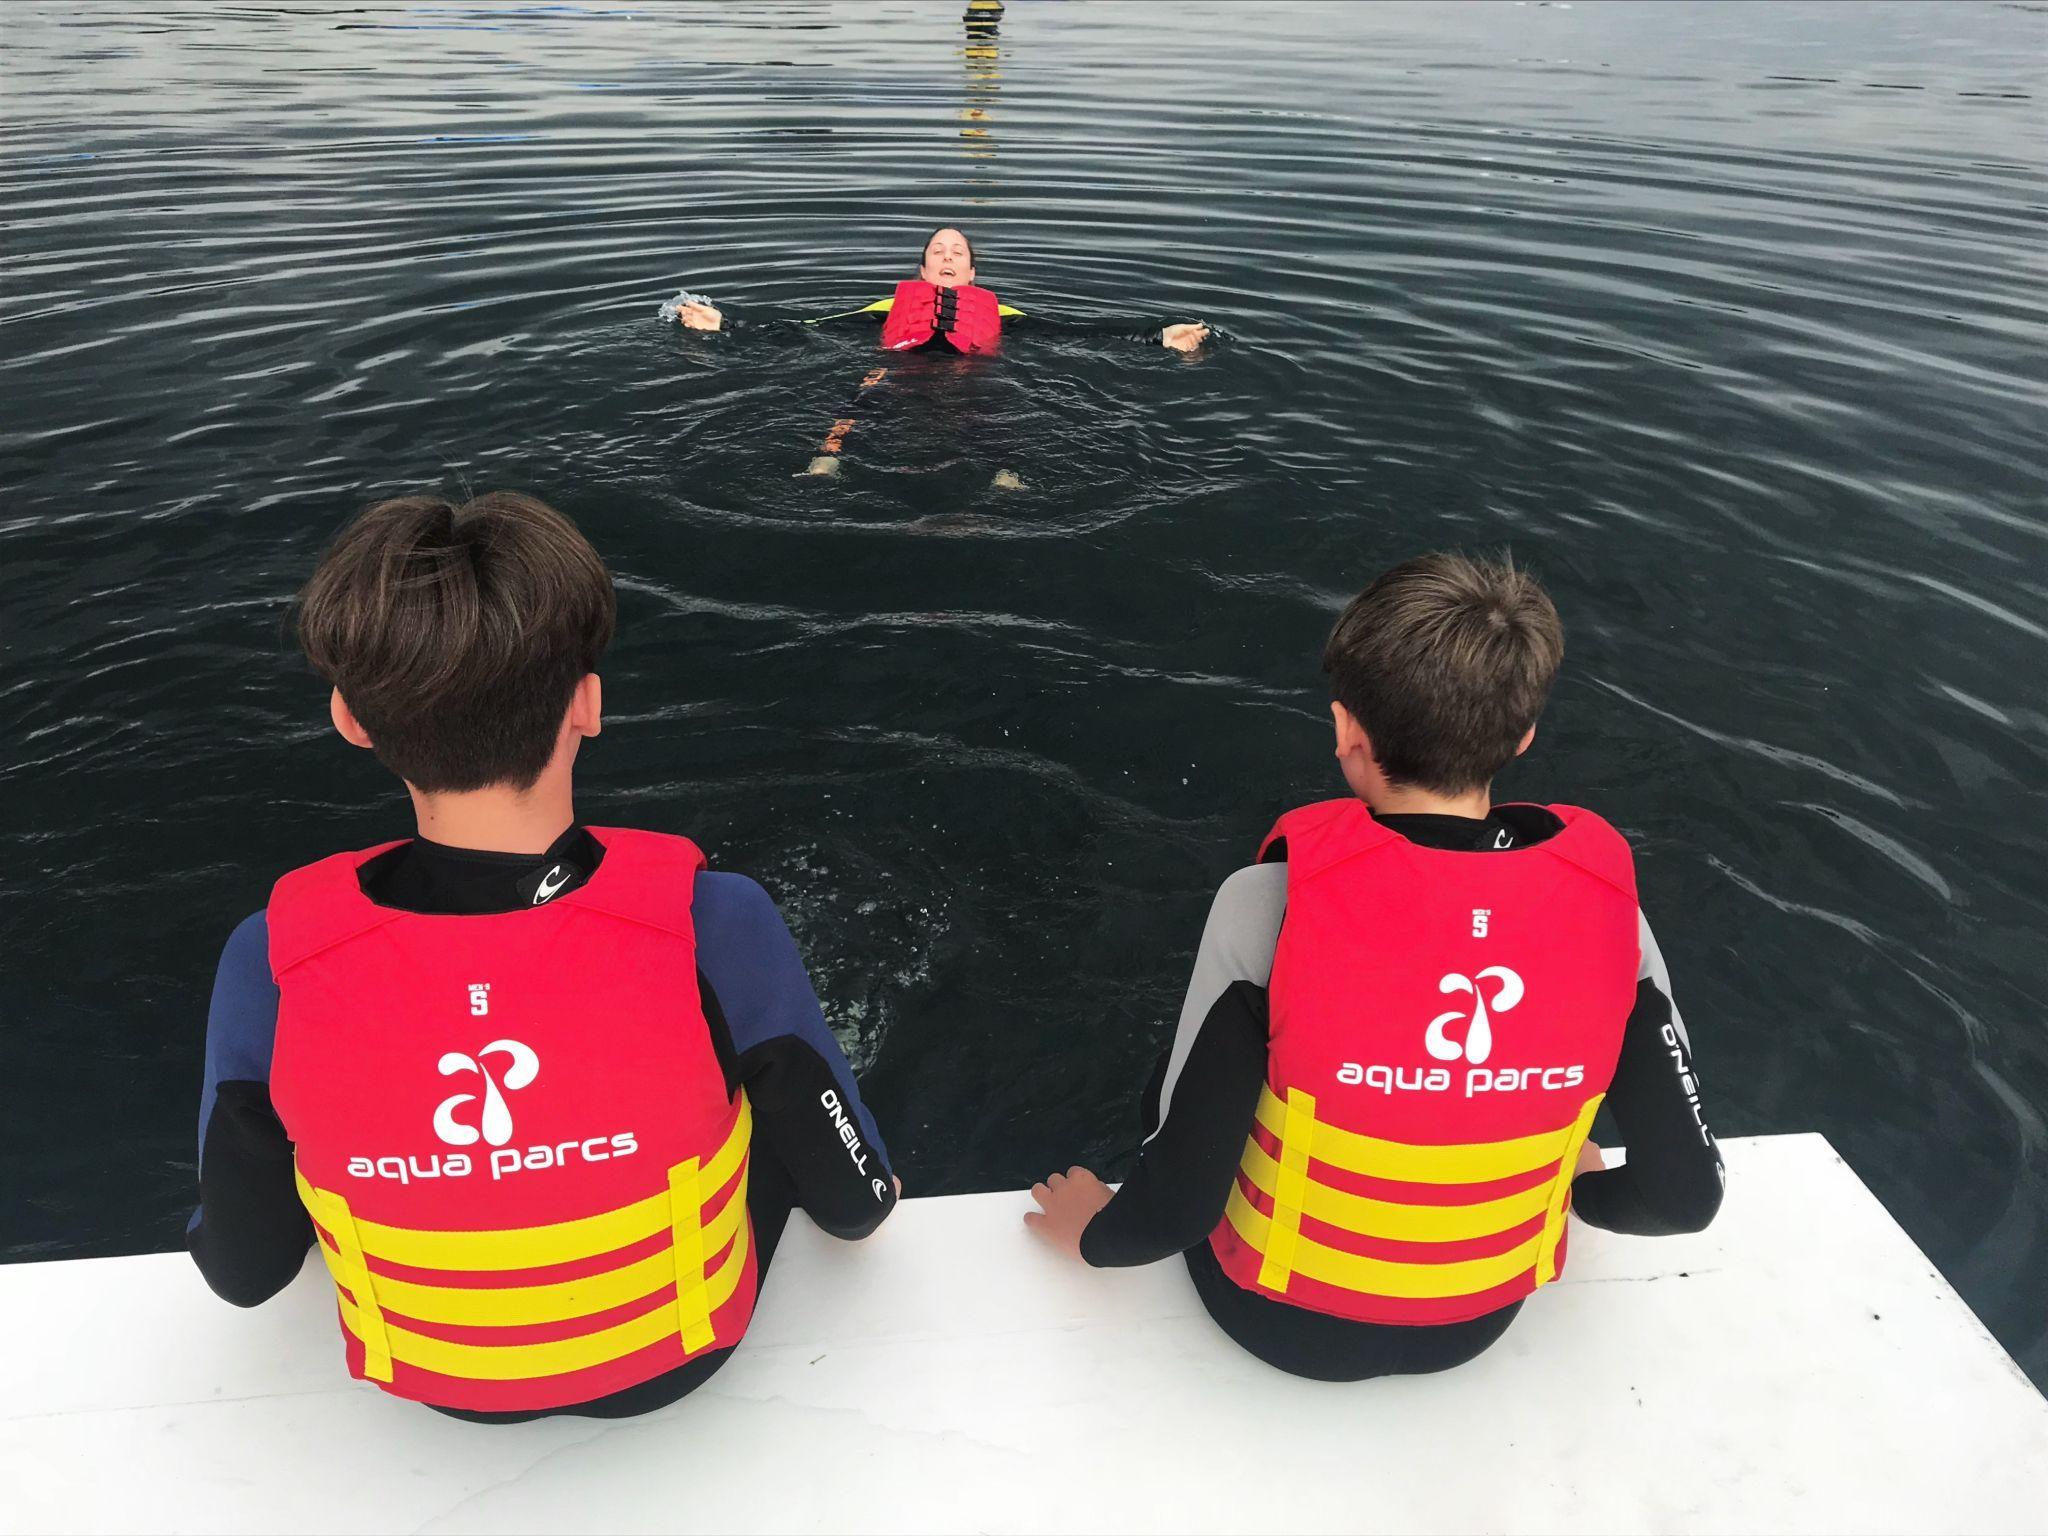 Mums love Aqua Parcs Willen Lake Milton Keynes